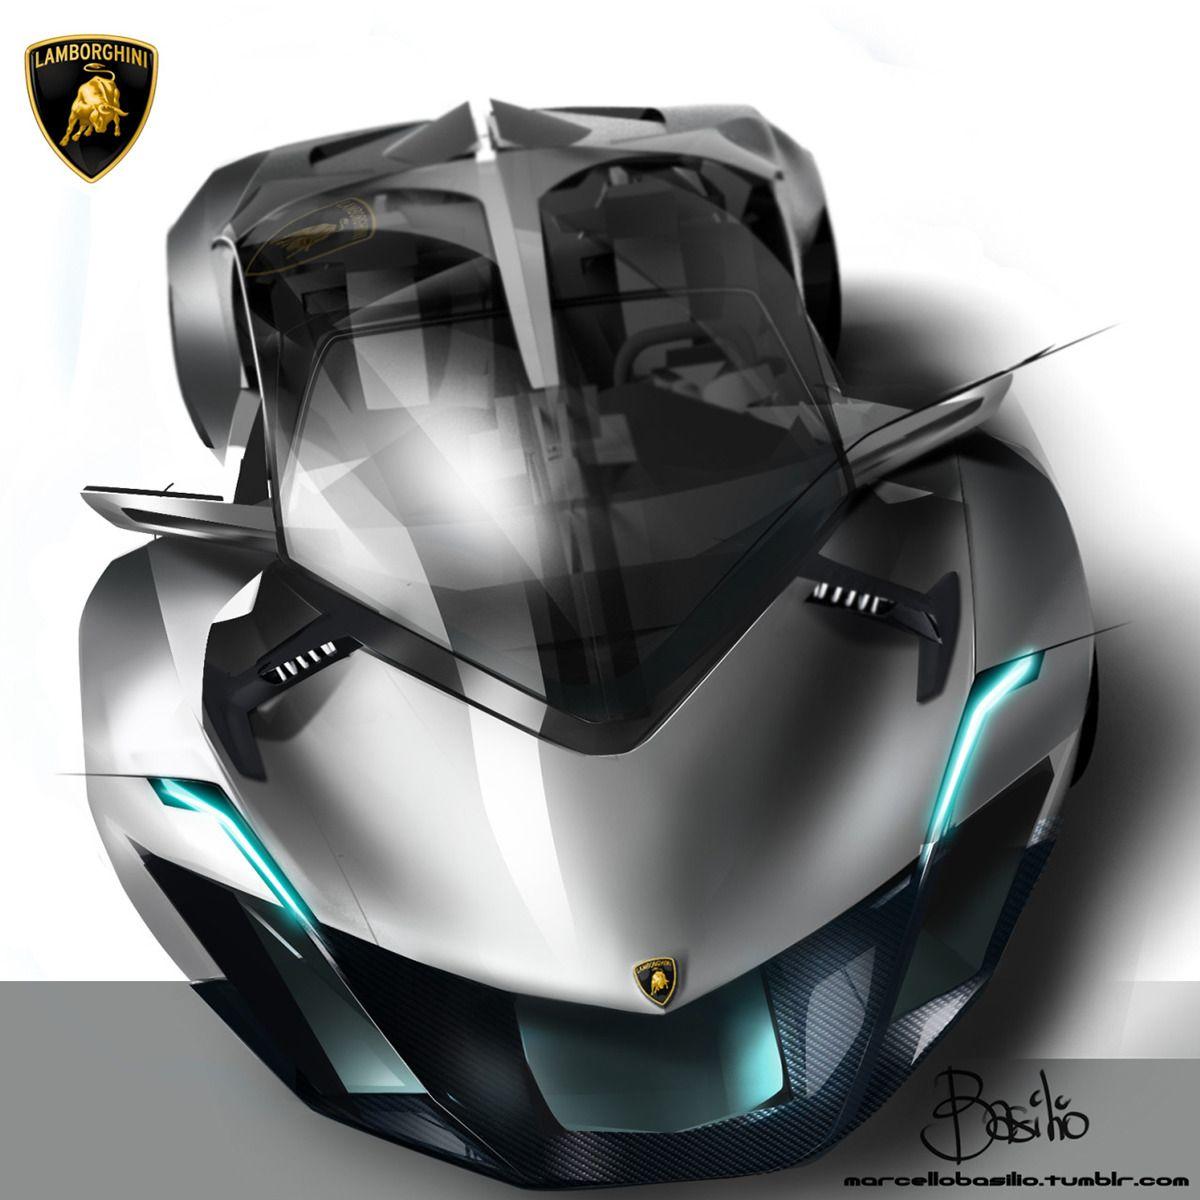 Lamborghini Muniz35 On Behance Follow Www.instagram.com